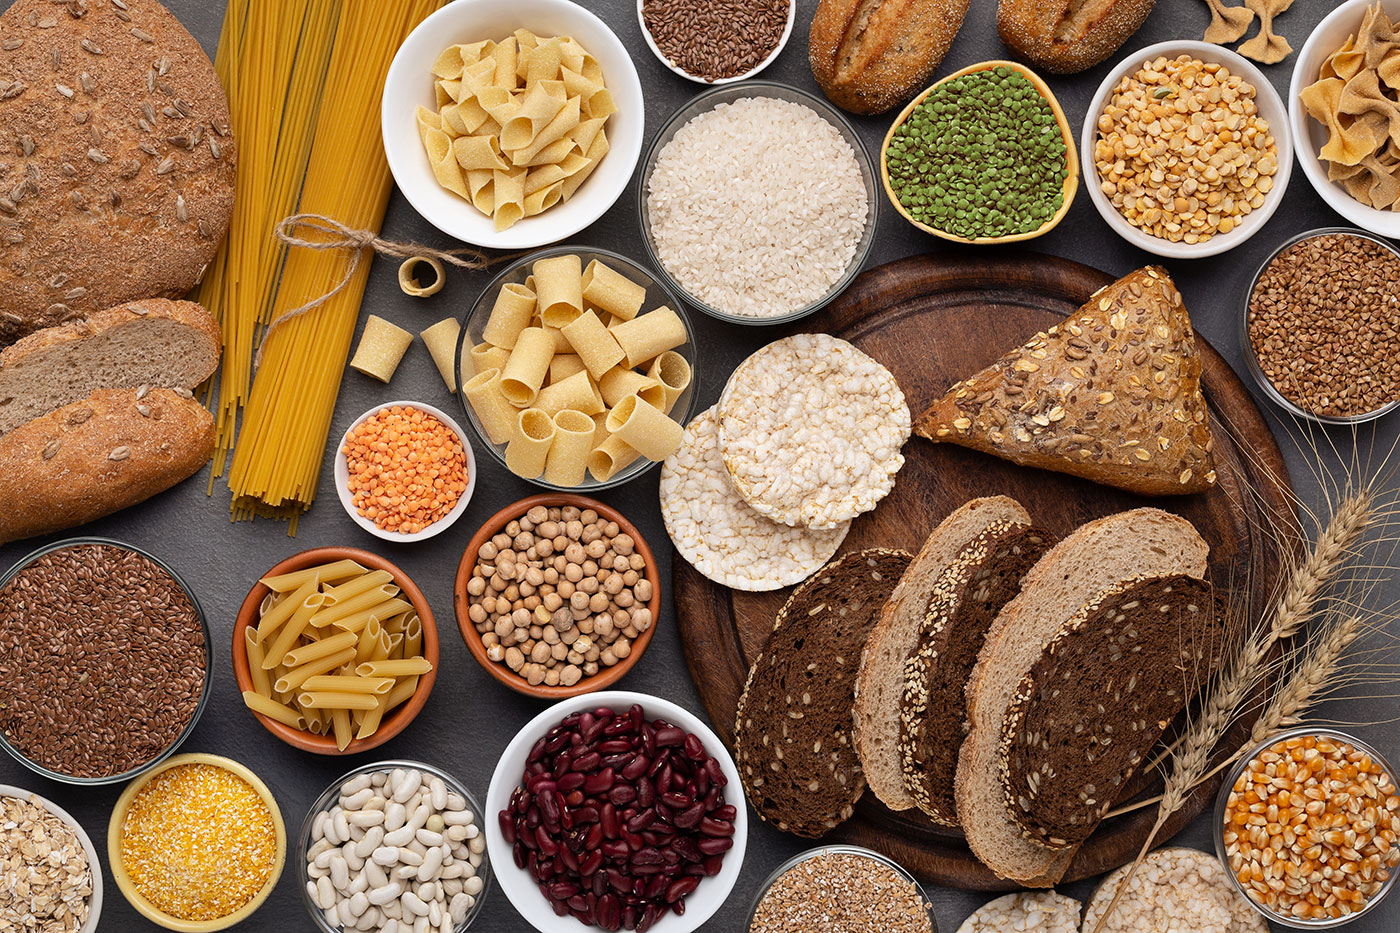 Gluten Free Cookery